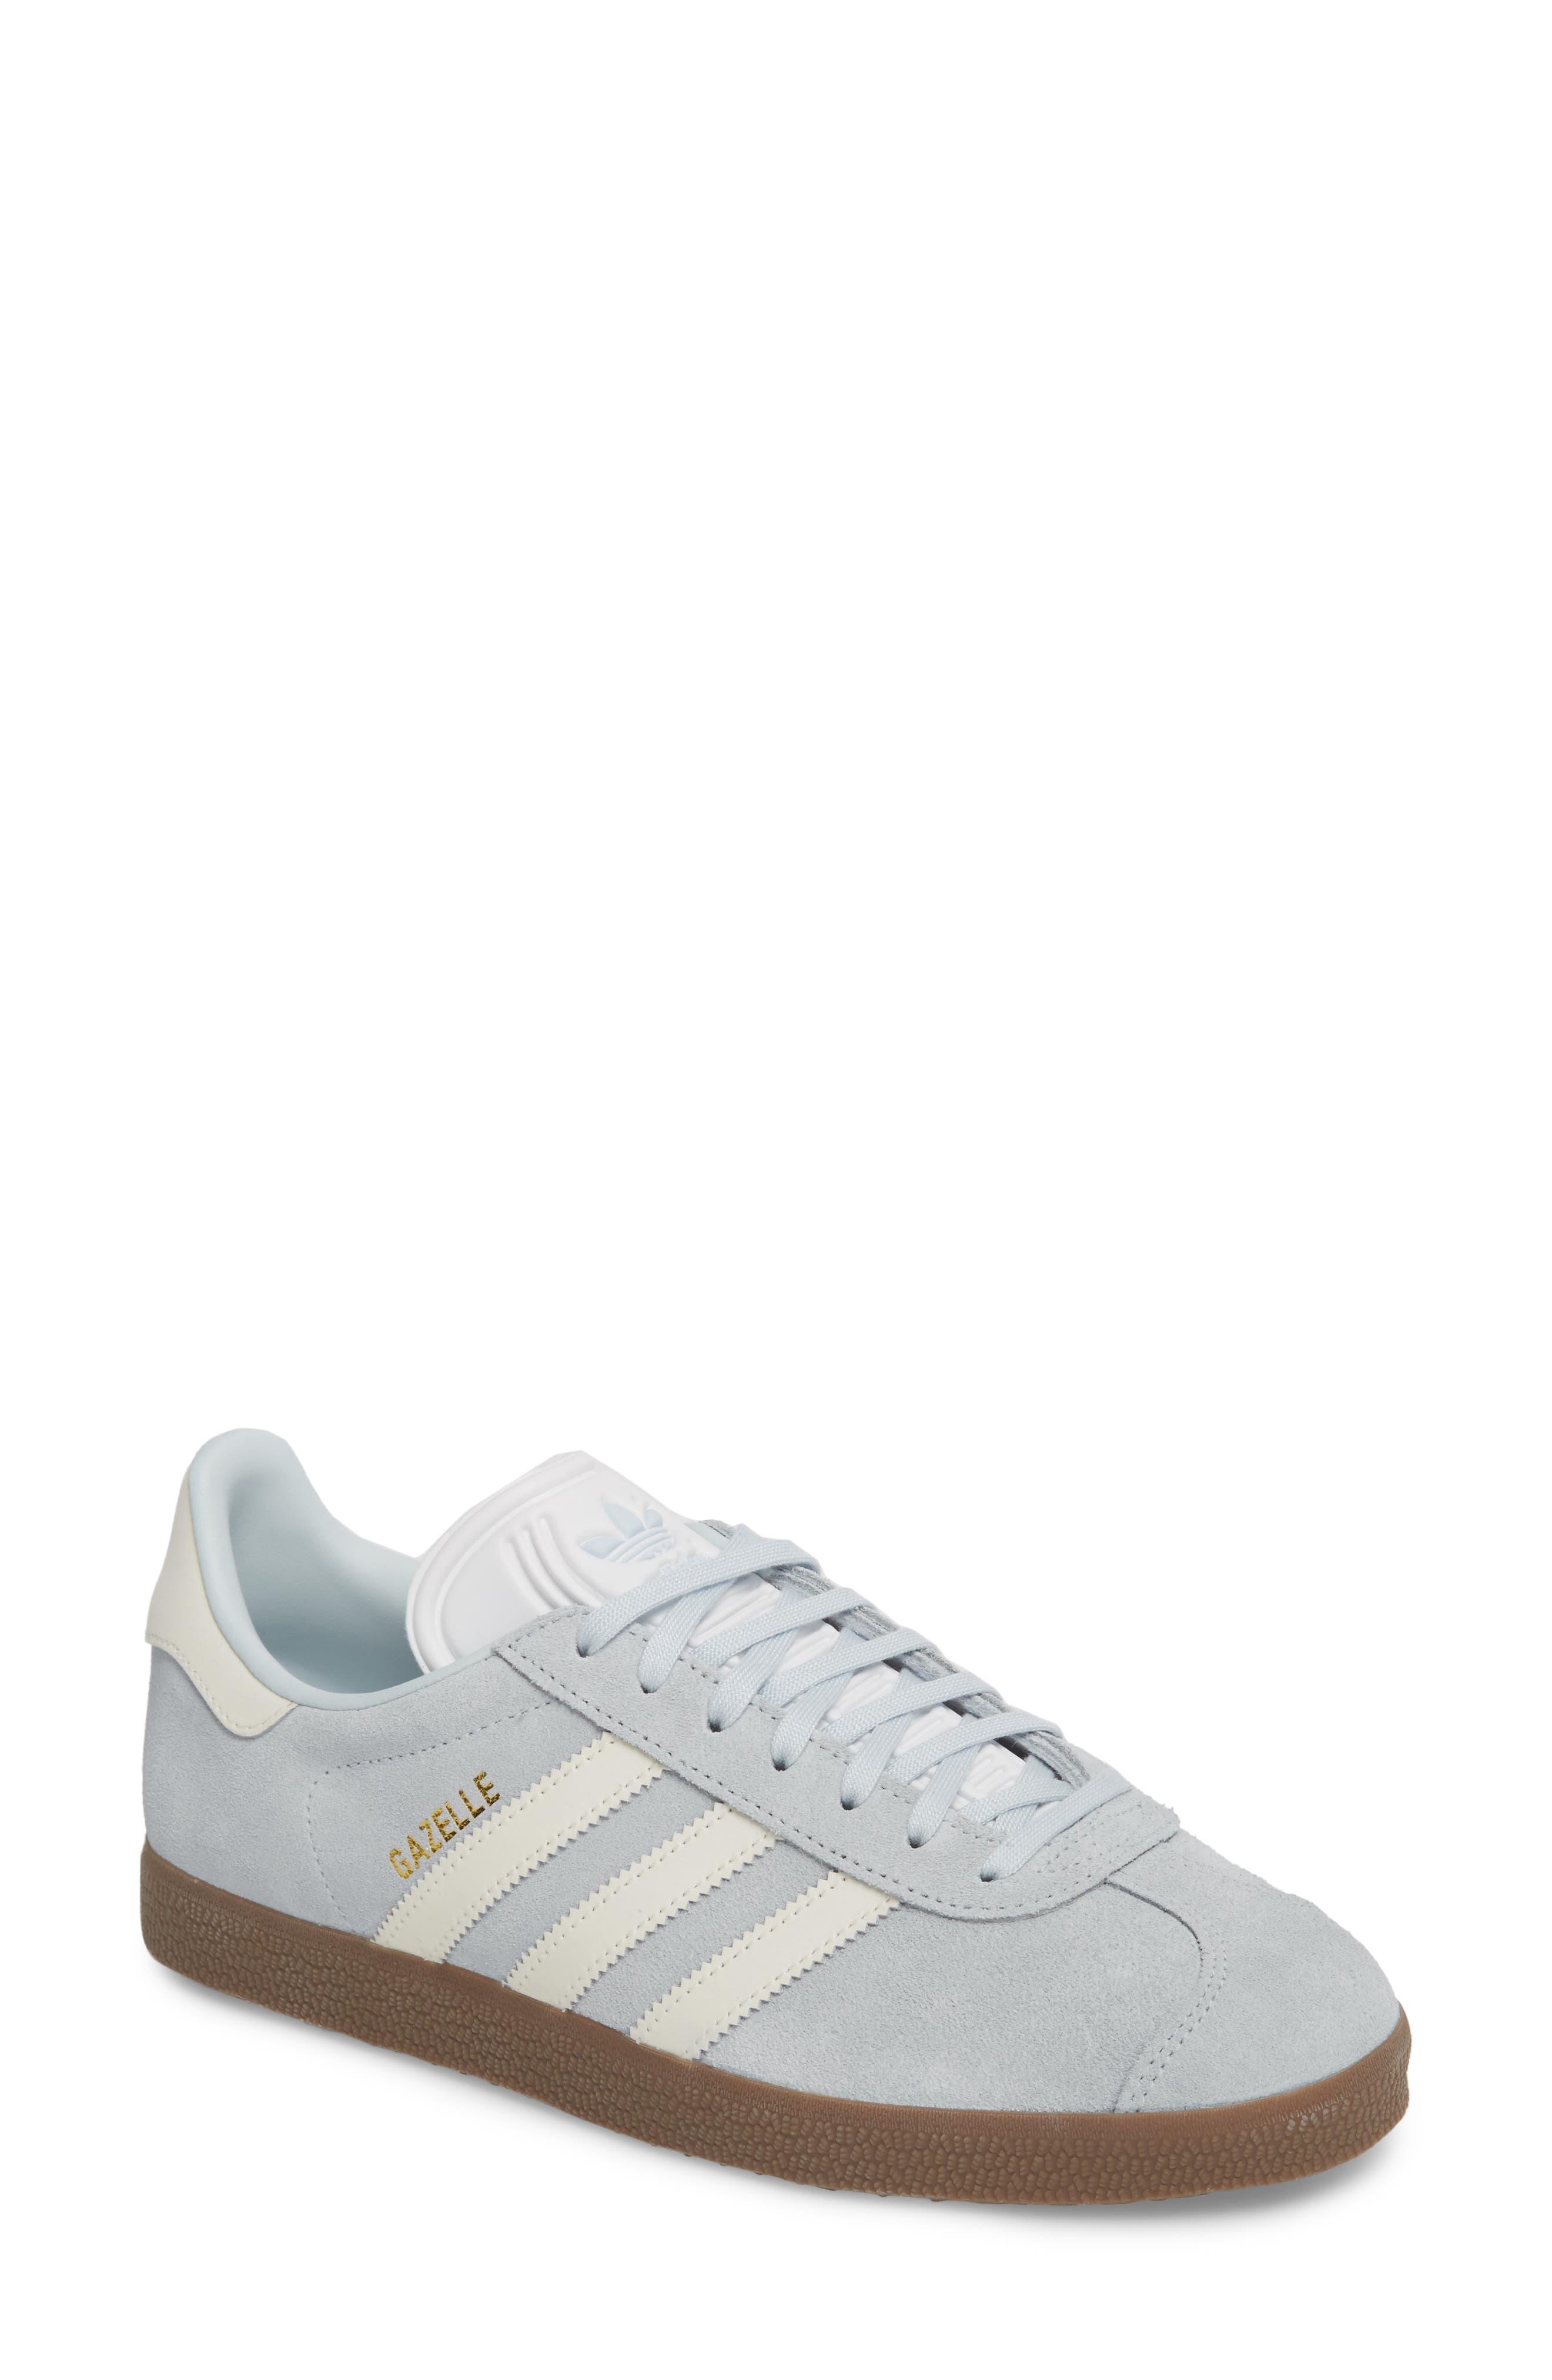 adidas gazelle womens gray